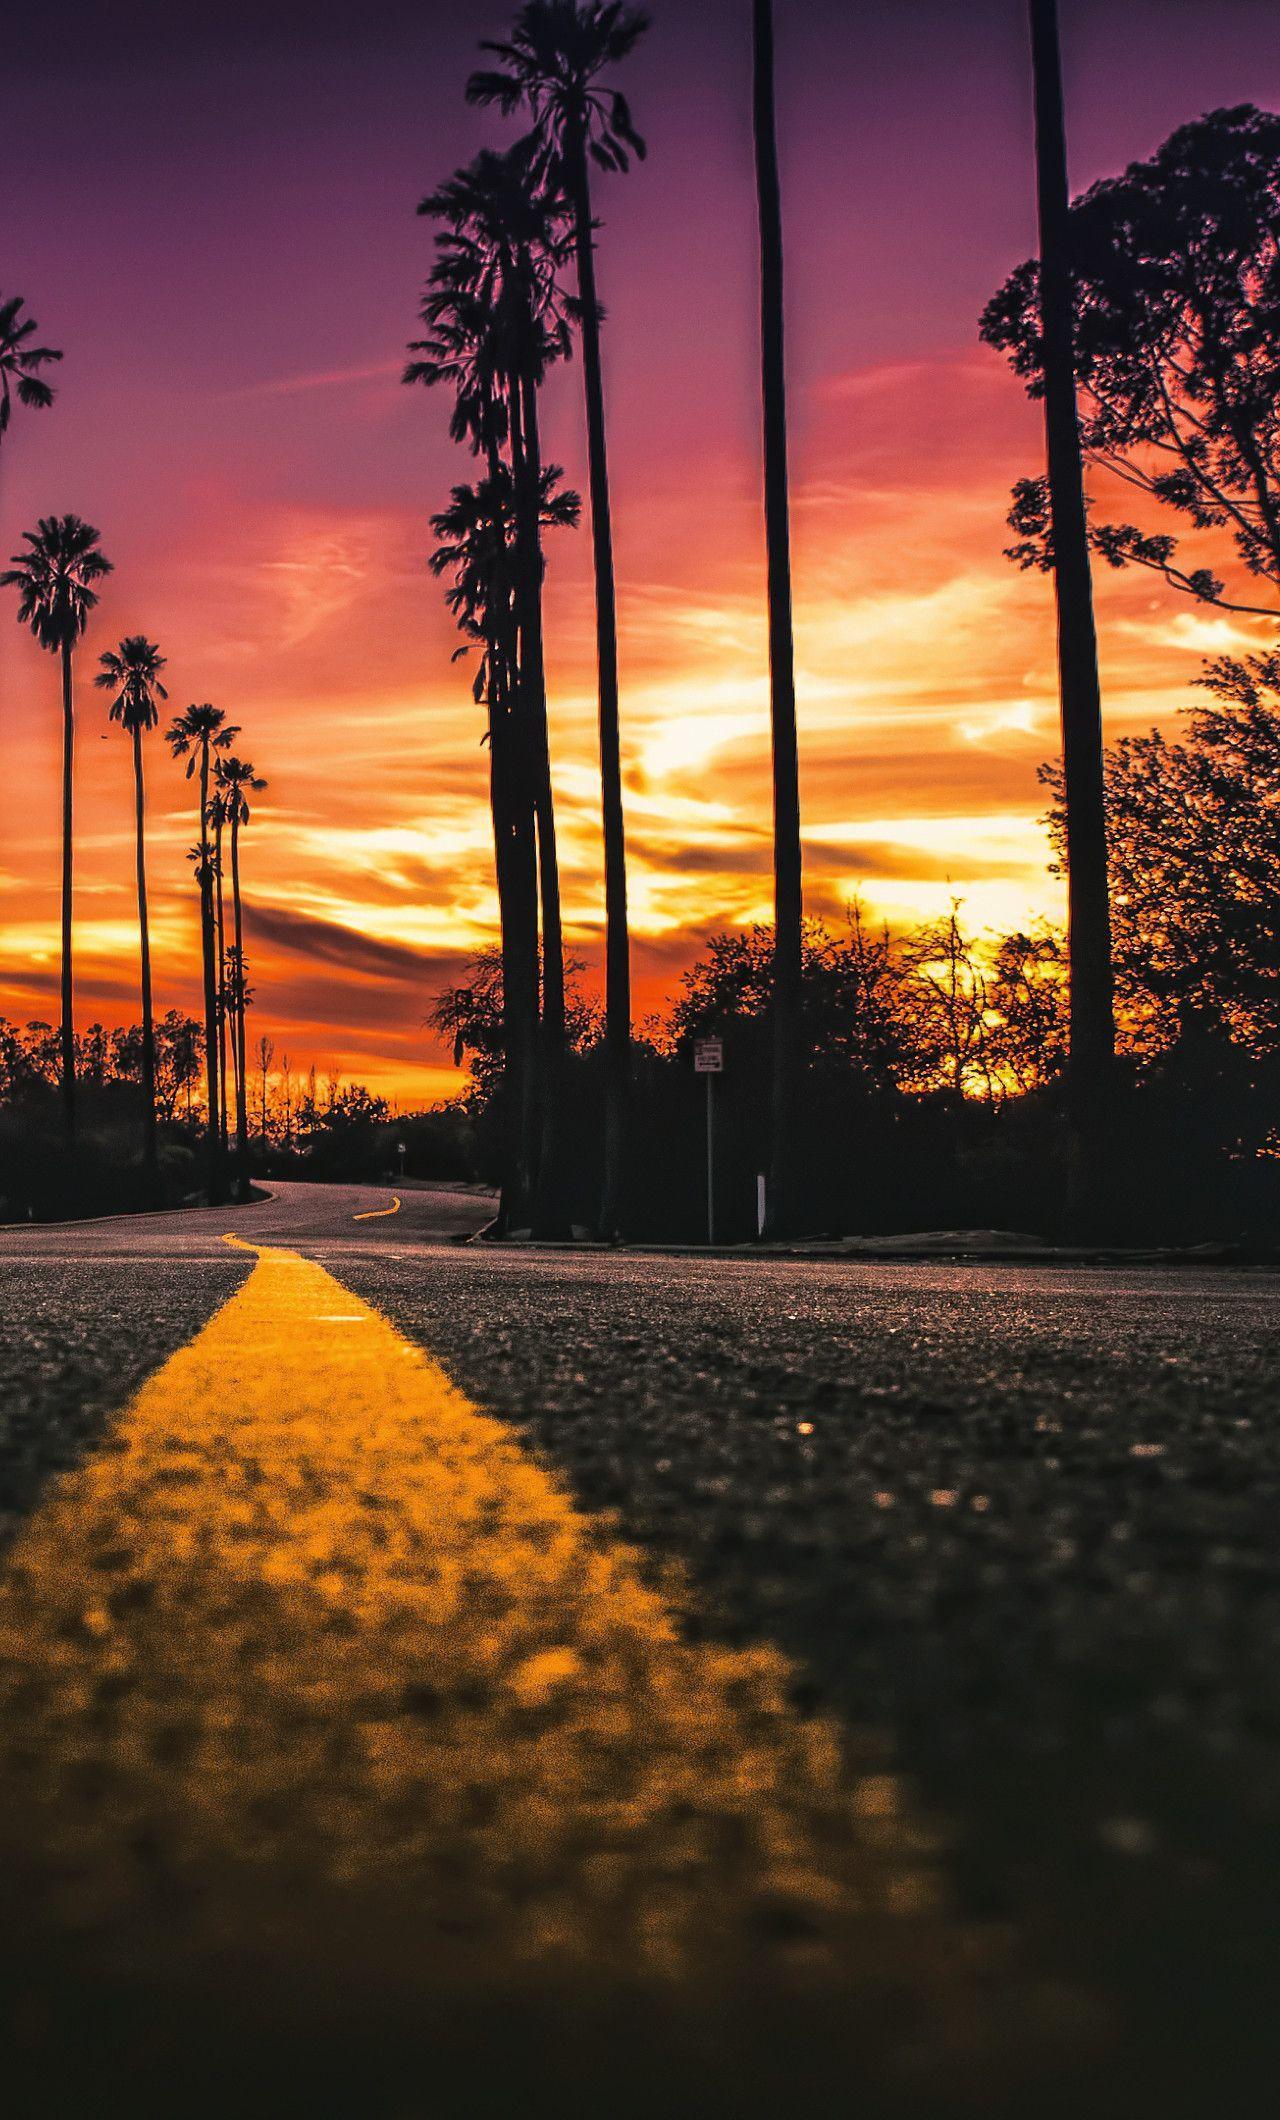 California Iphone Wallpapers Top Free California Iphone Backgrounds Wallpaperaccess